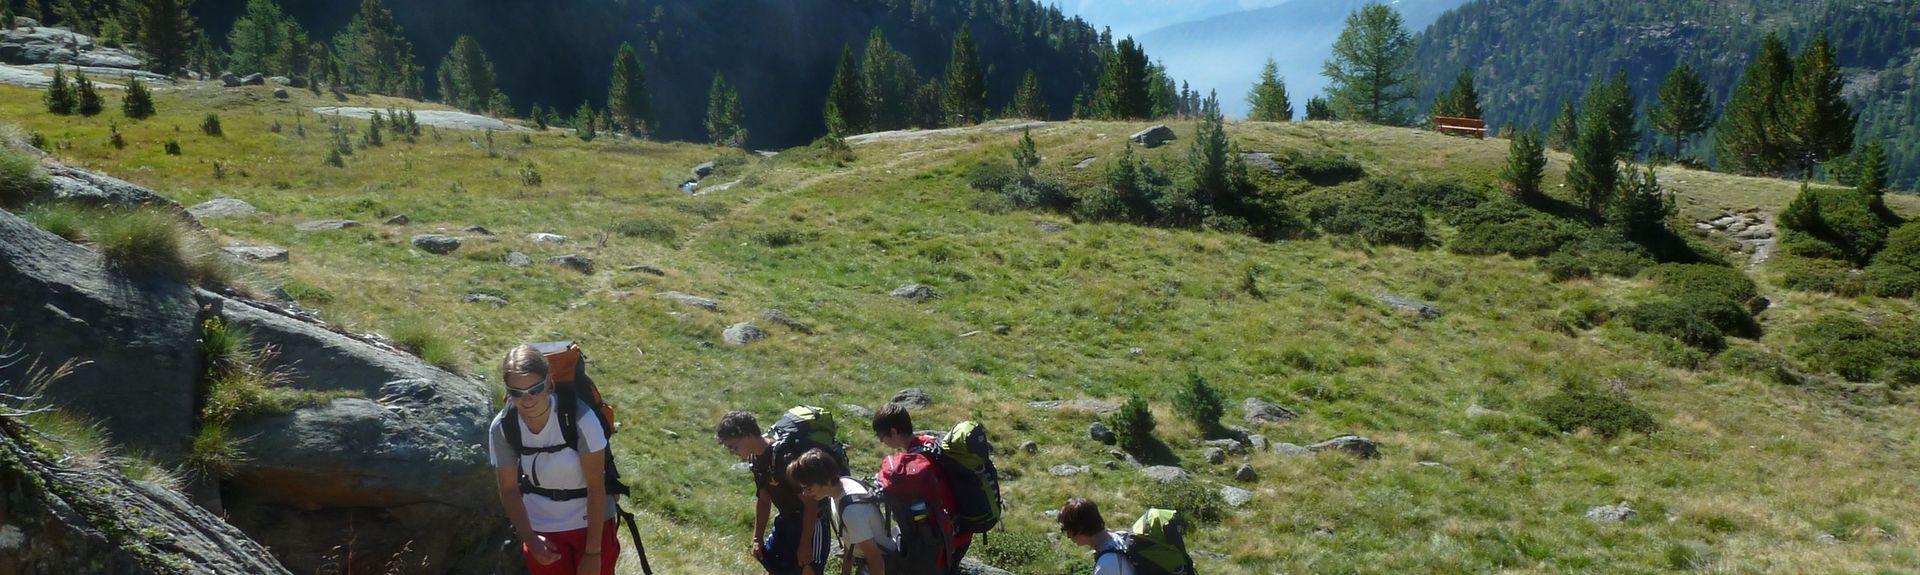 Rabbi, Trentino-Alto Adige, Italia